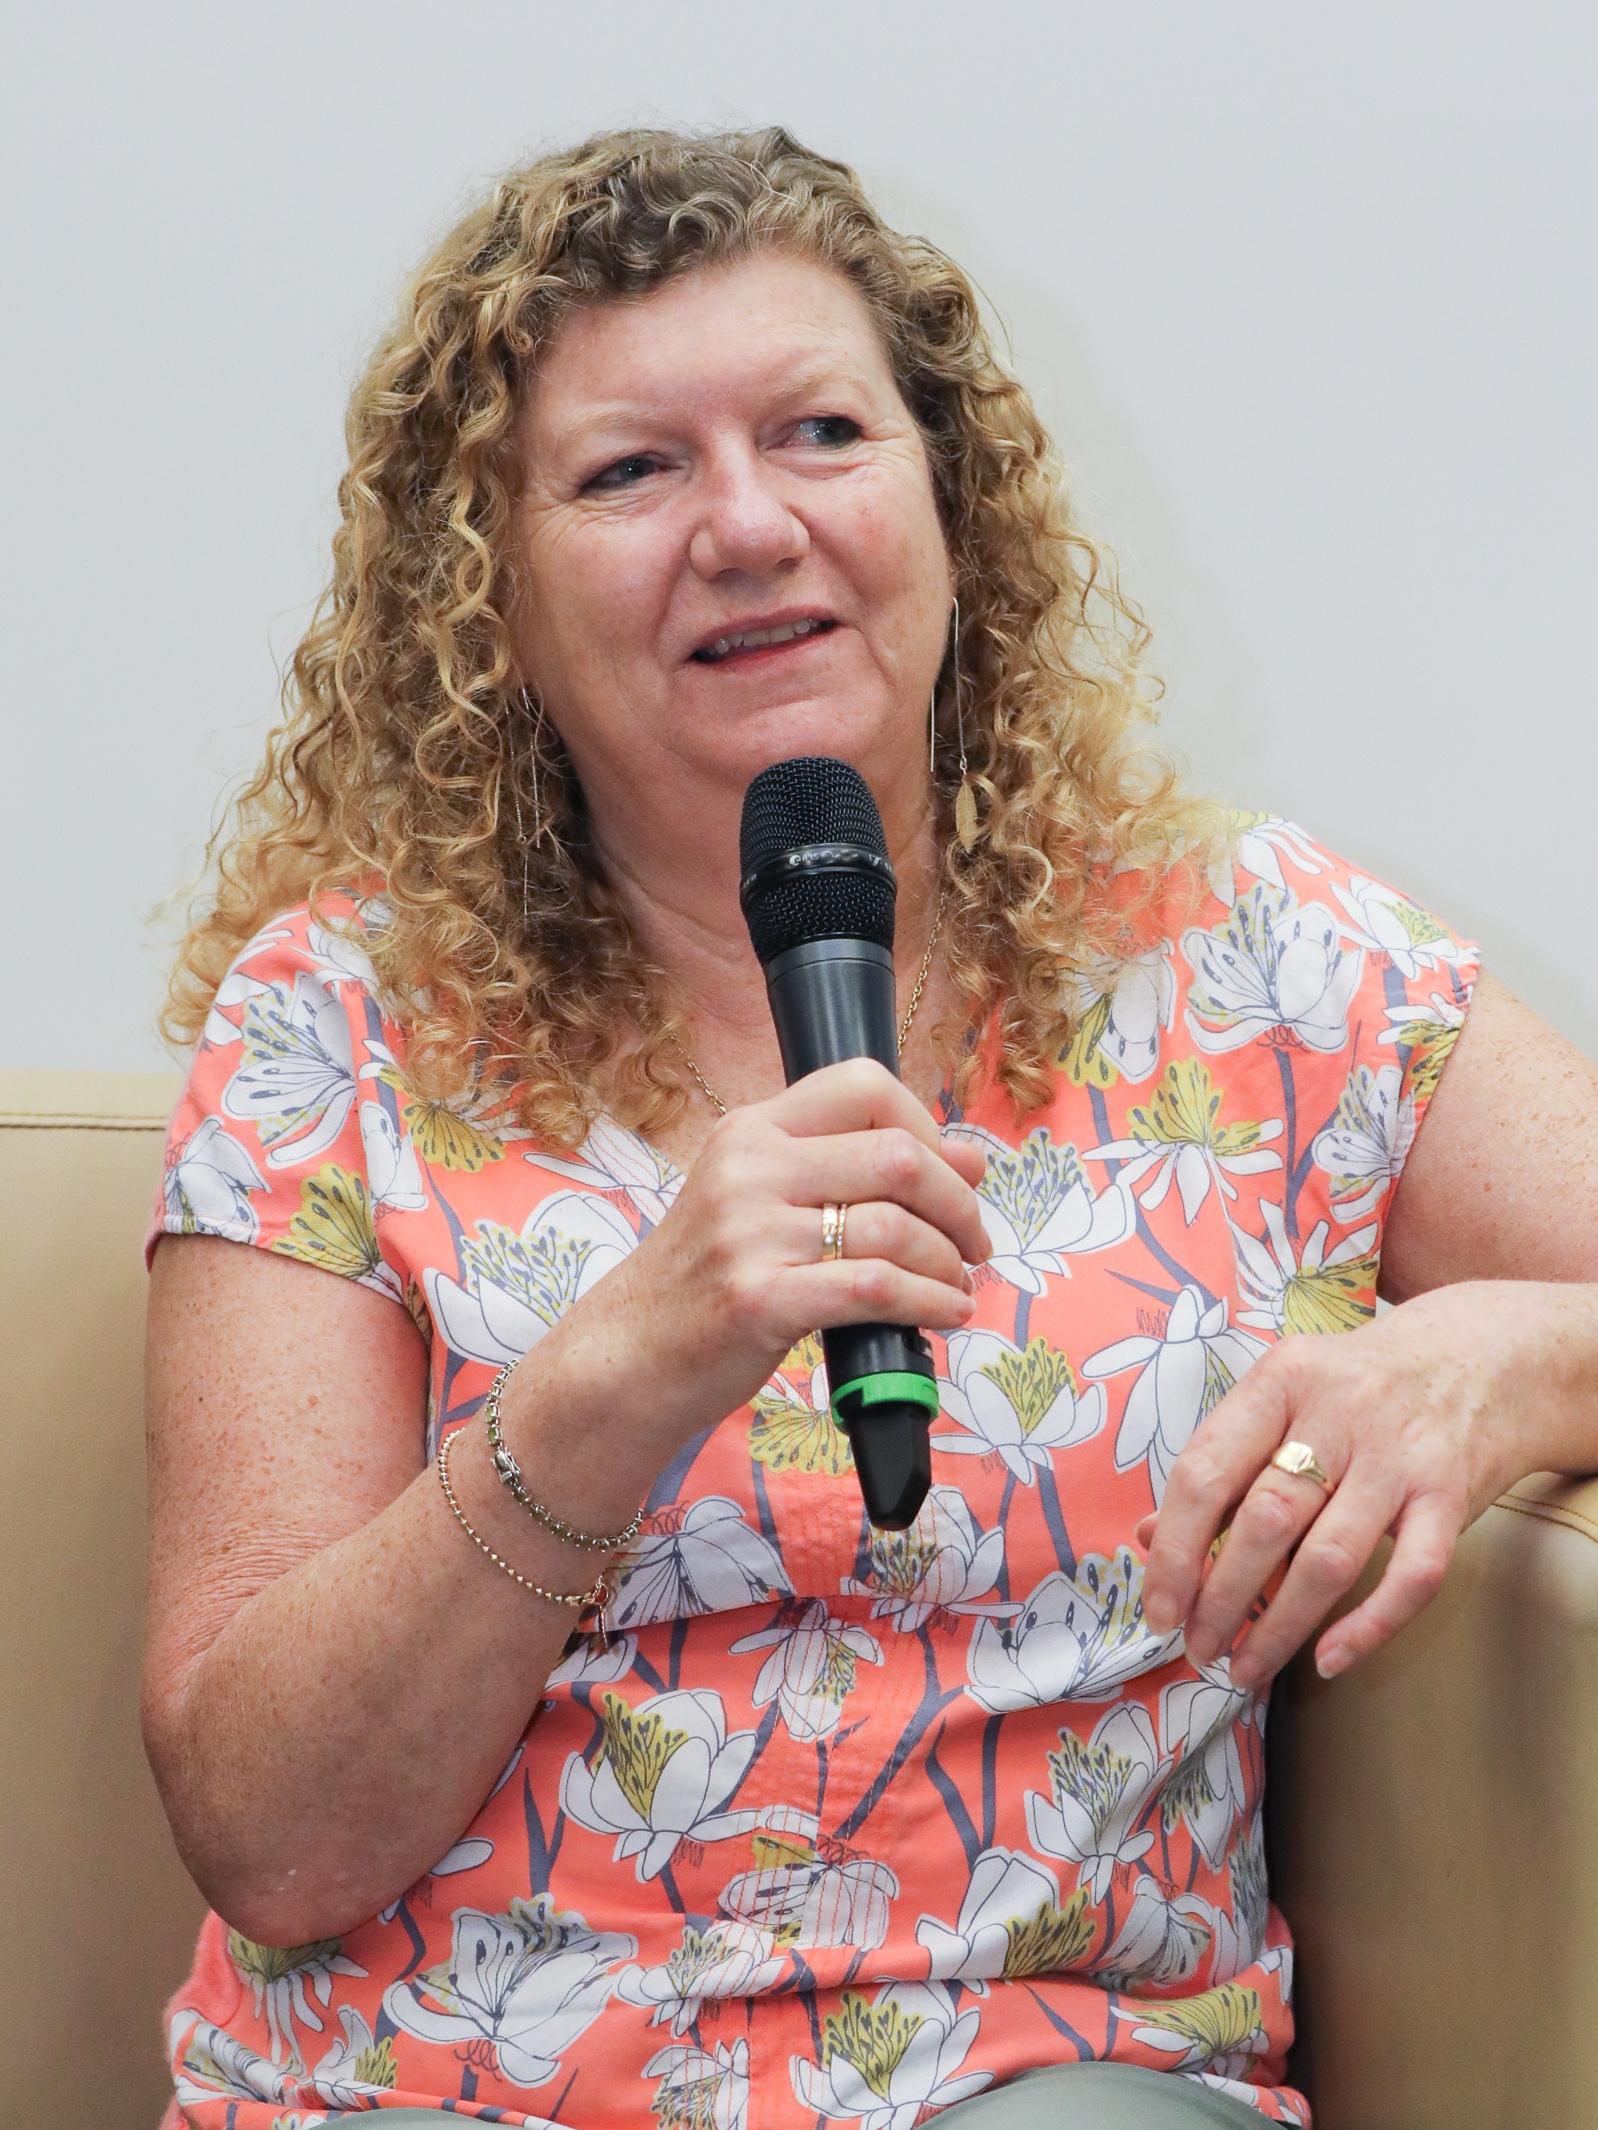 Ms Jo Ruxton, Producer of A Plastic Ocean